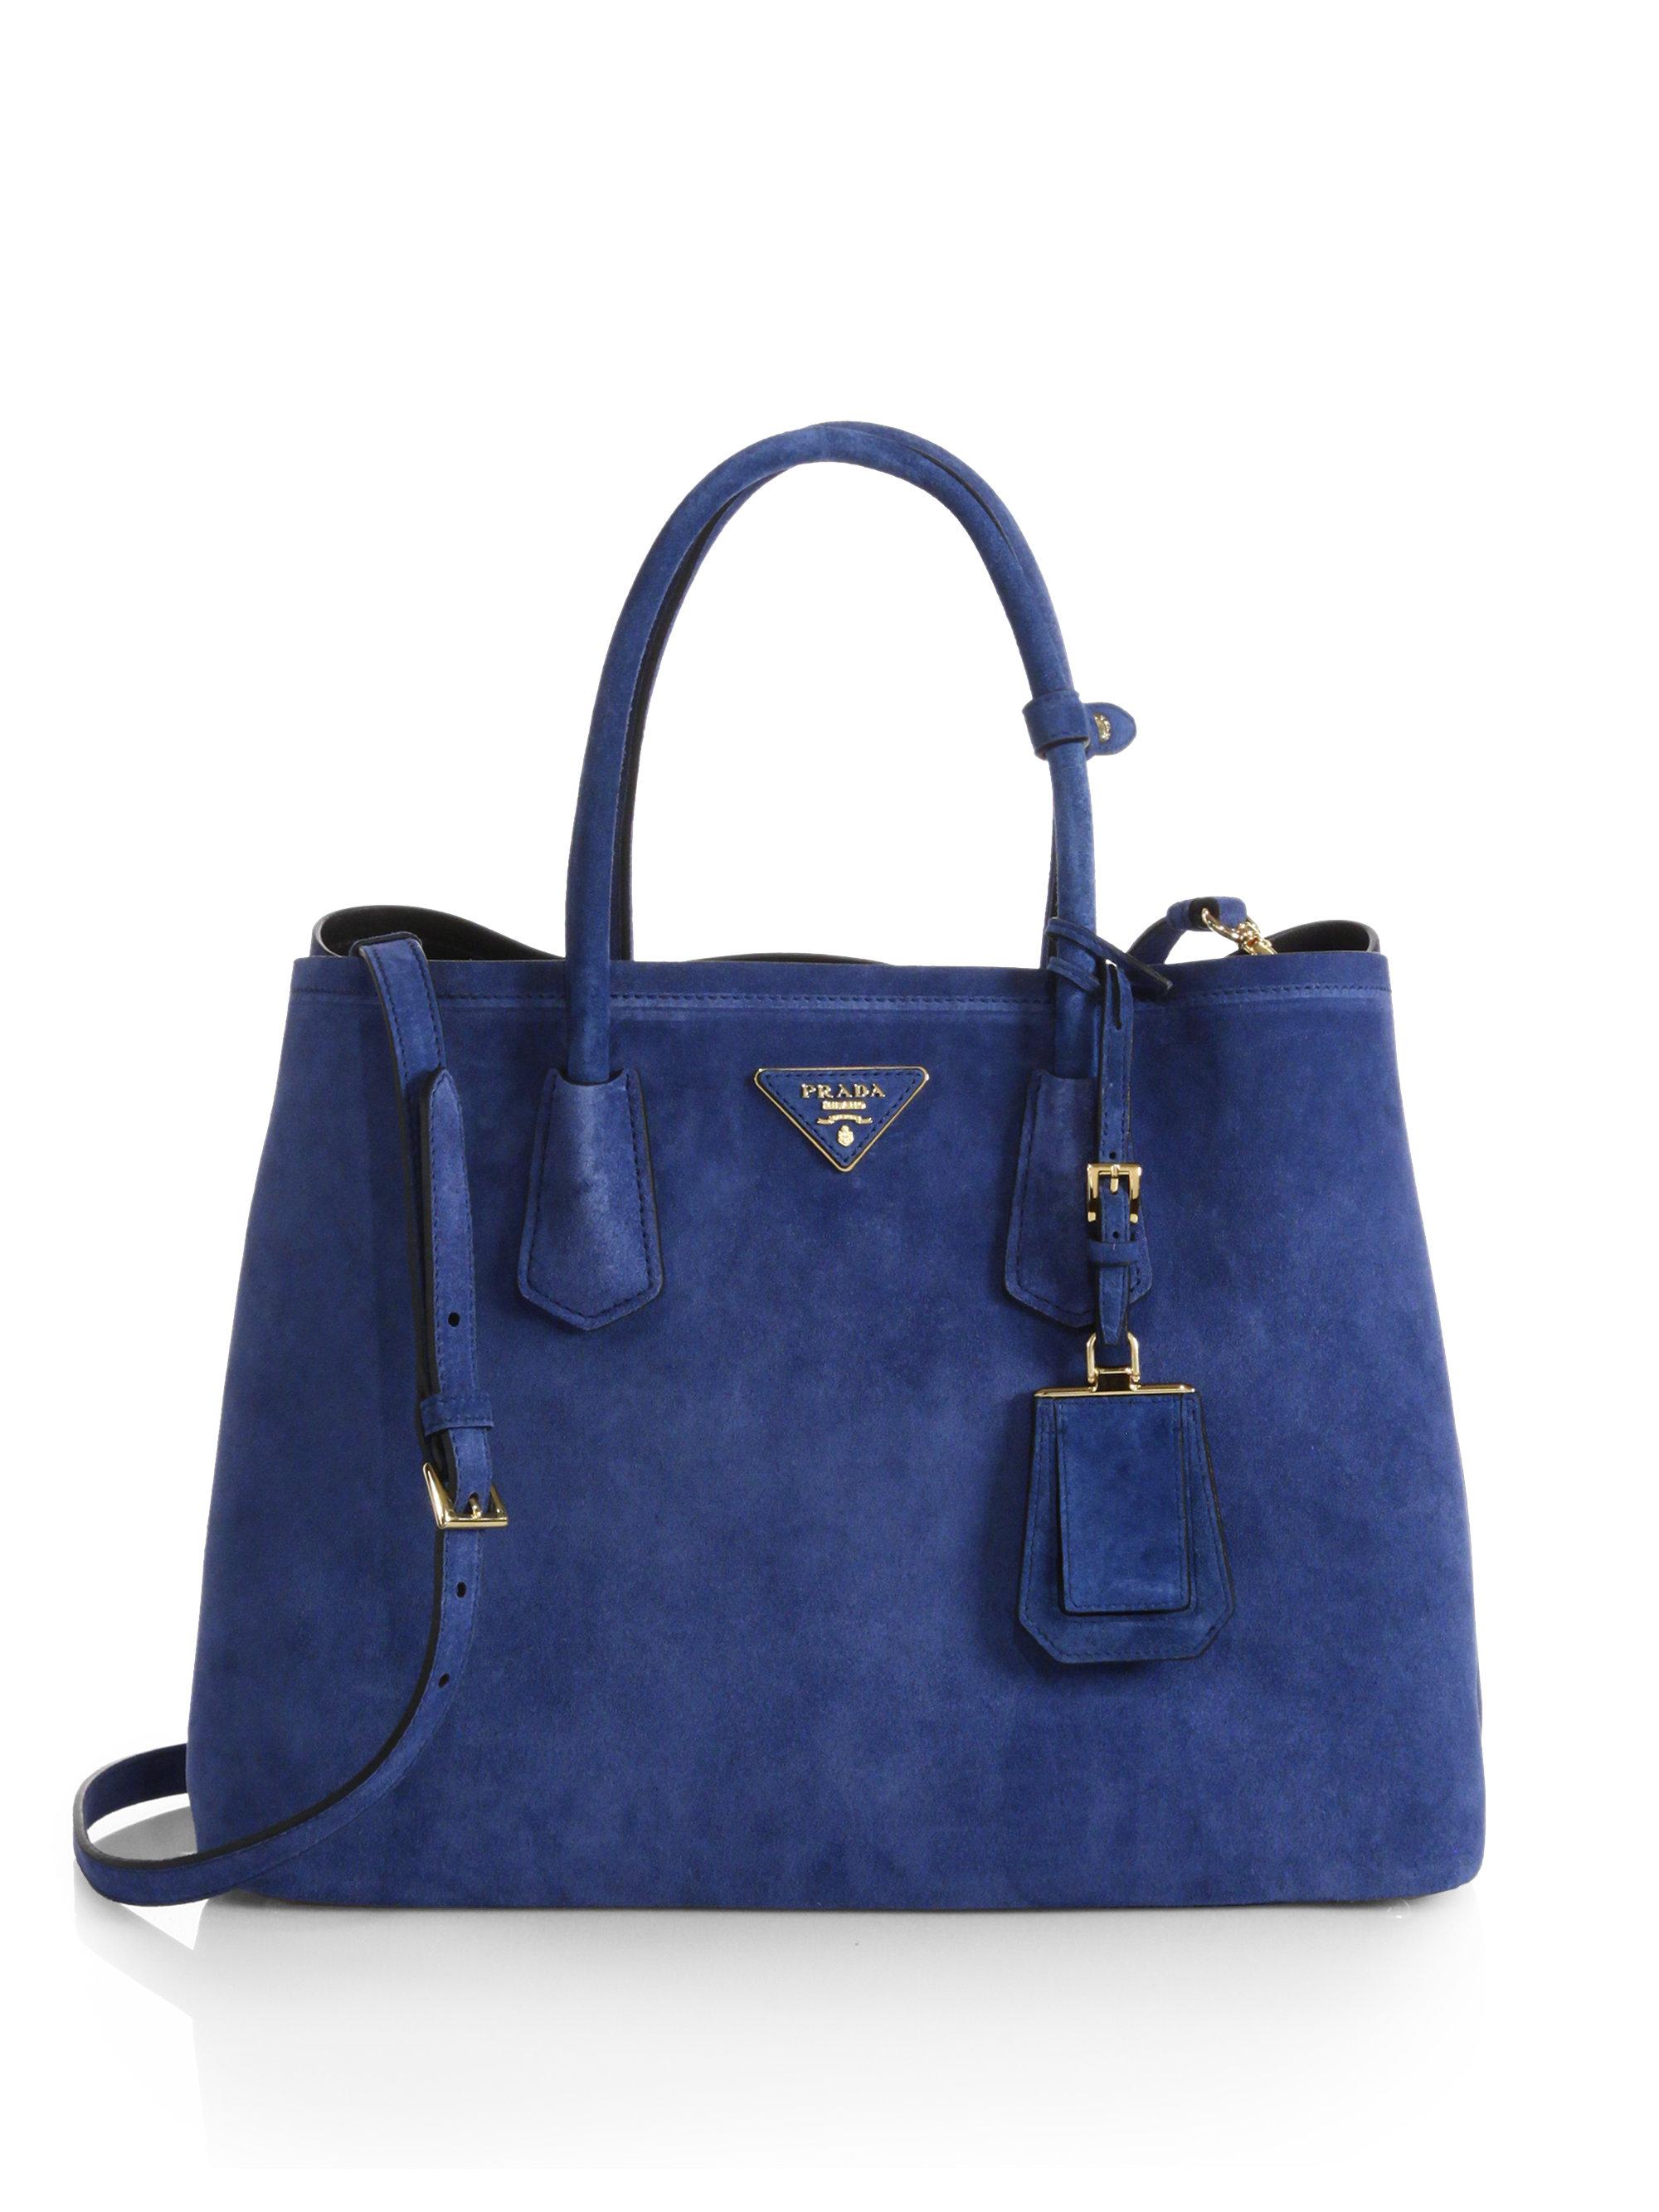 6641193fbc867 Prada Suede Double Bag in Blue - Lyst